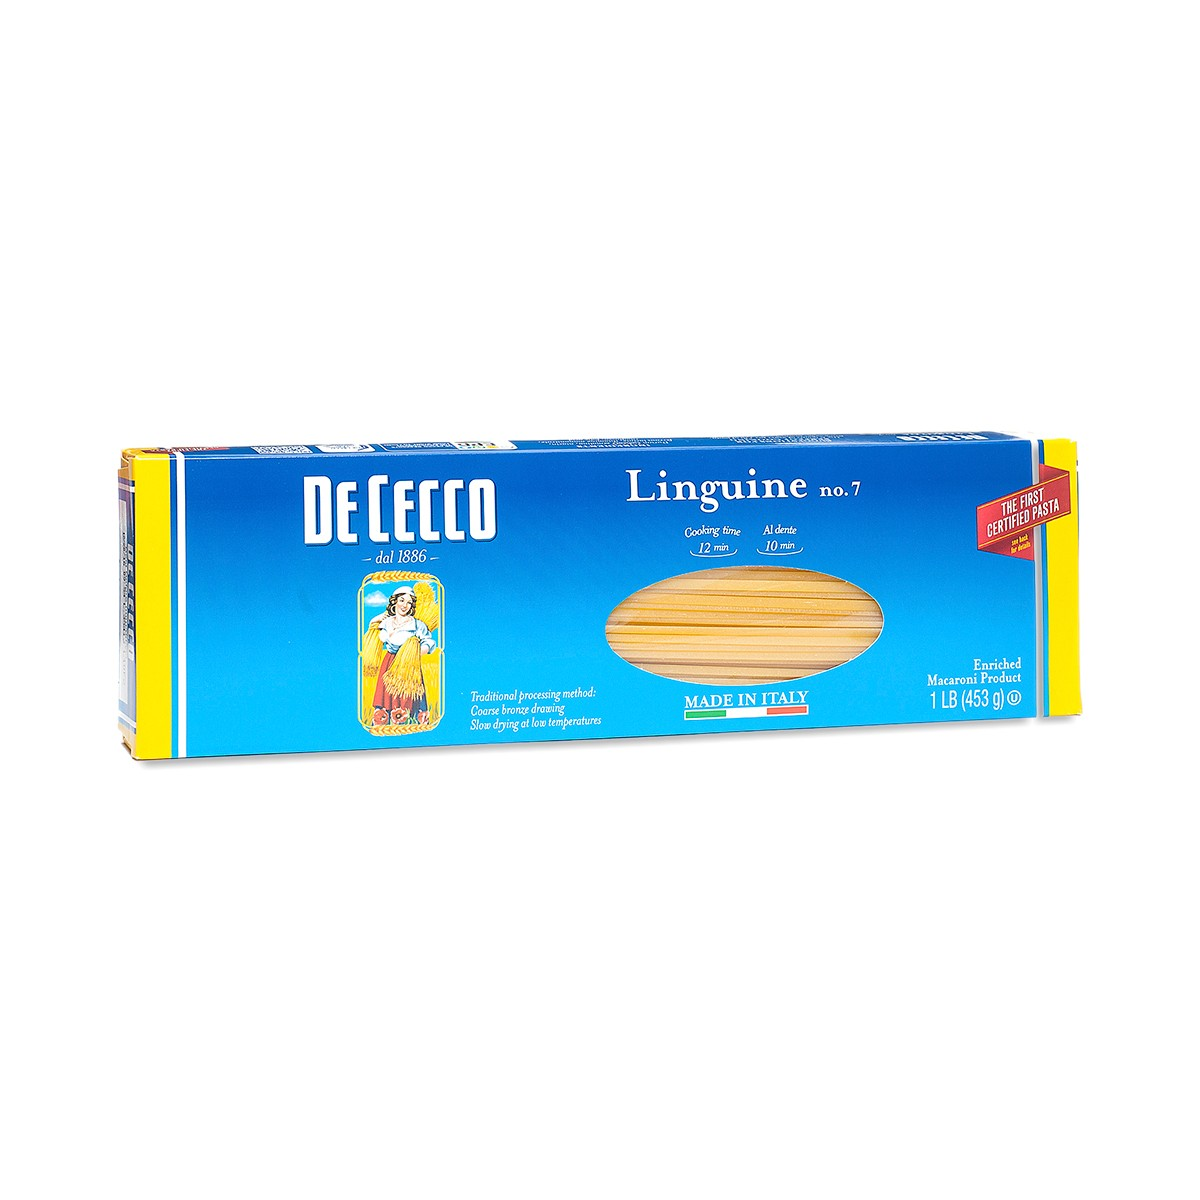 16 oz Linguine Pasta by De Cecco Pasta - Thrive Market